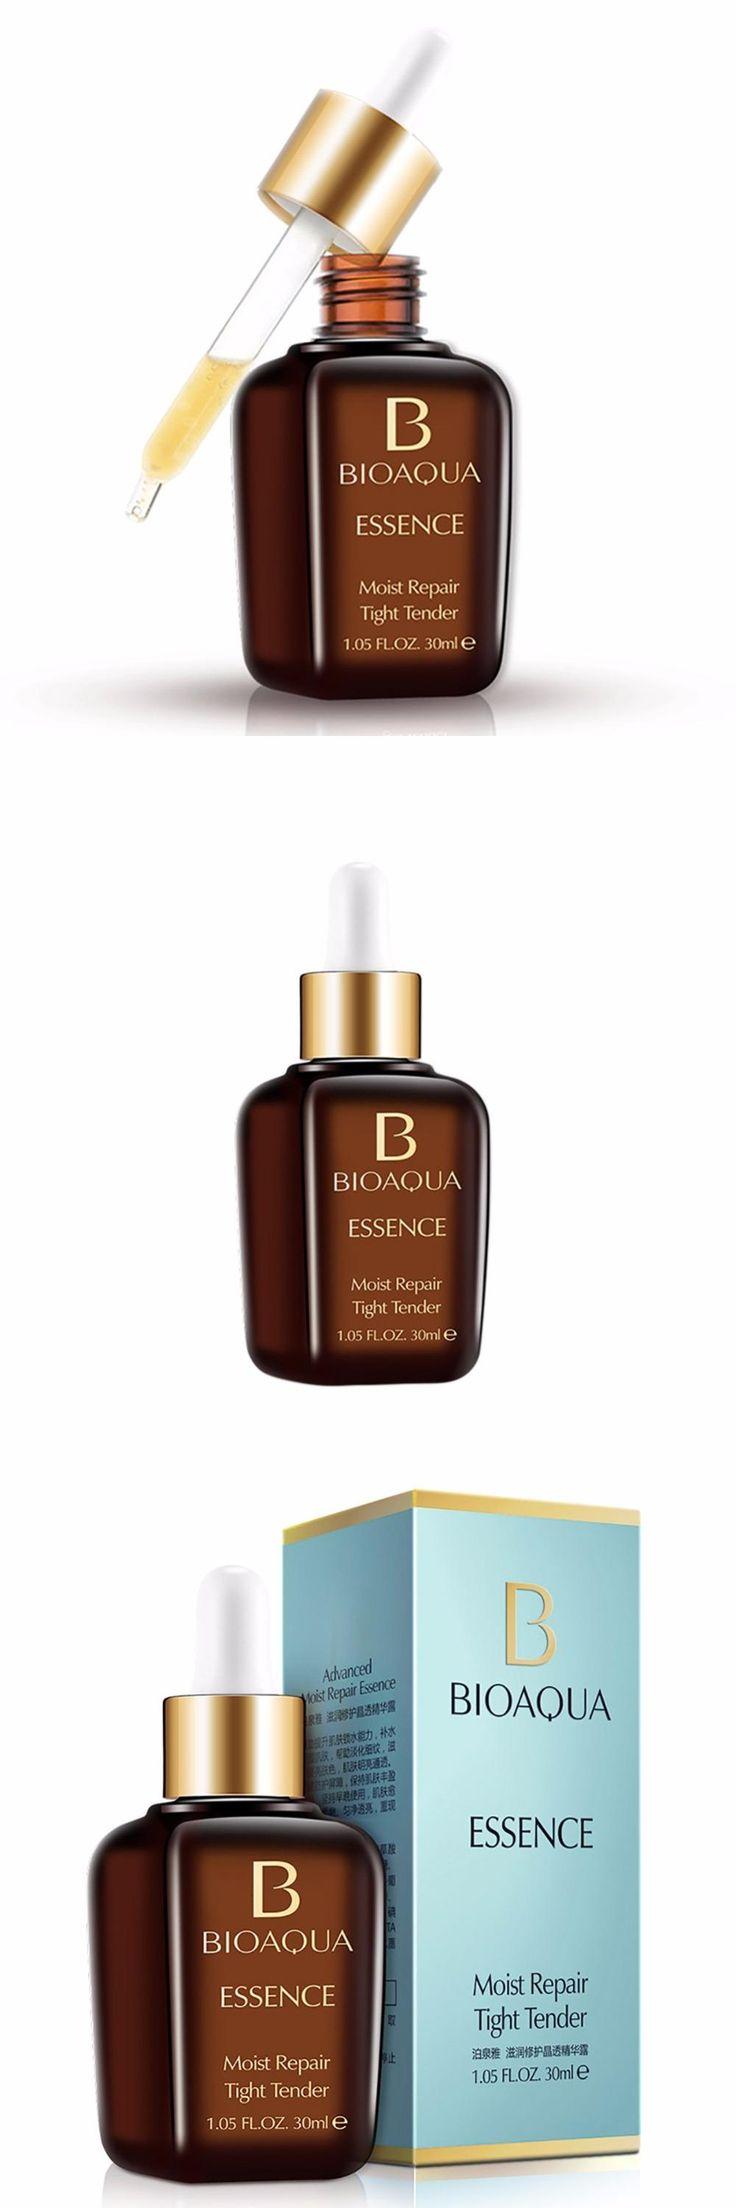 [Visit to Buy] Pro Hyaluronic Acid Liquid Anti Wrinkle Serum Skin Care Whitening Moisturizing DayCream Anti Aging Collagen Essence Oil  #Advertisement